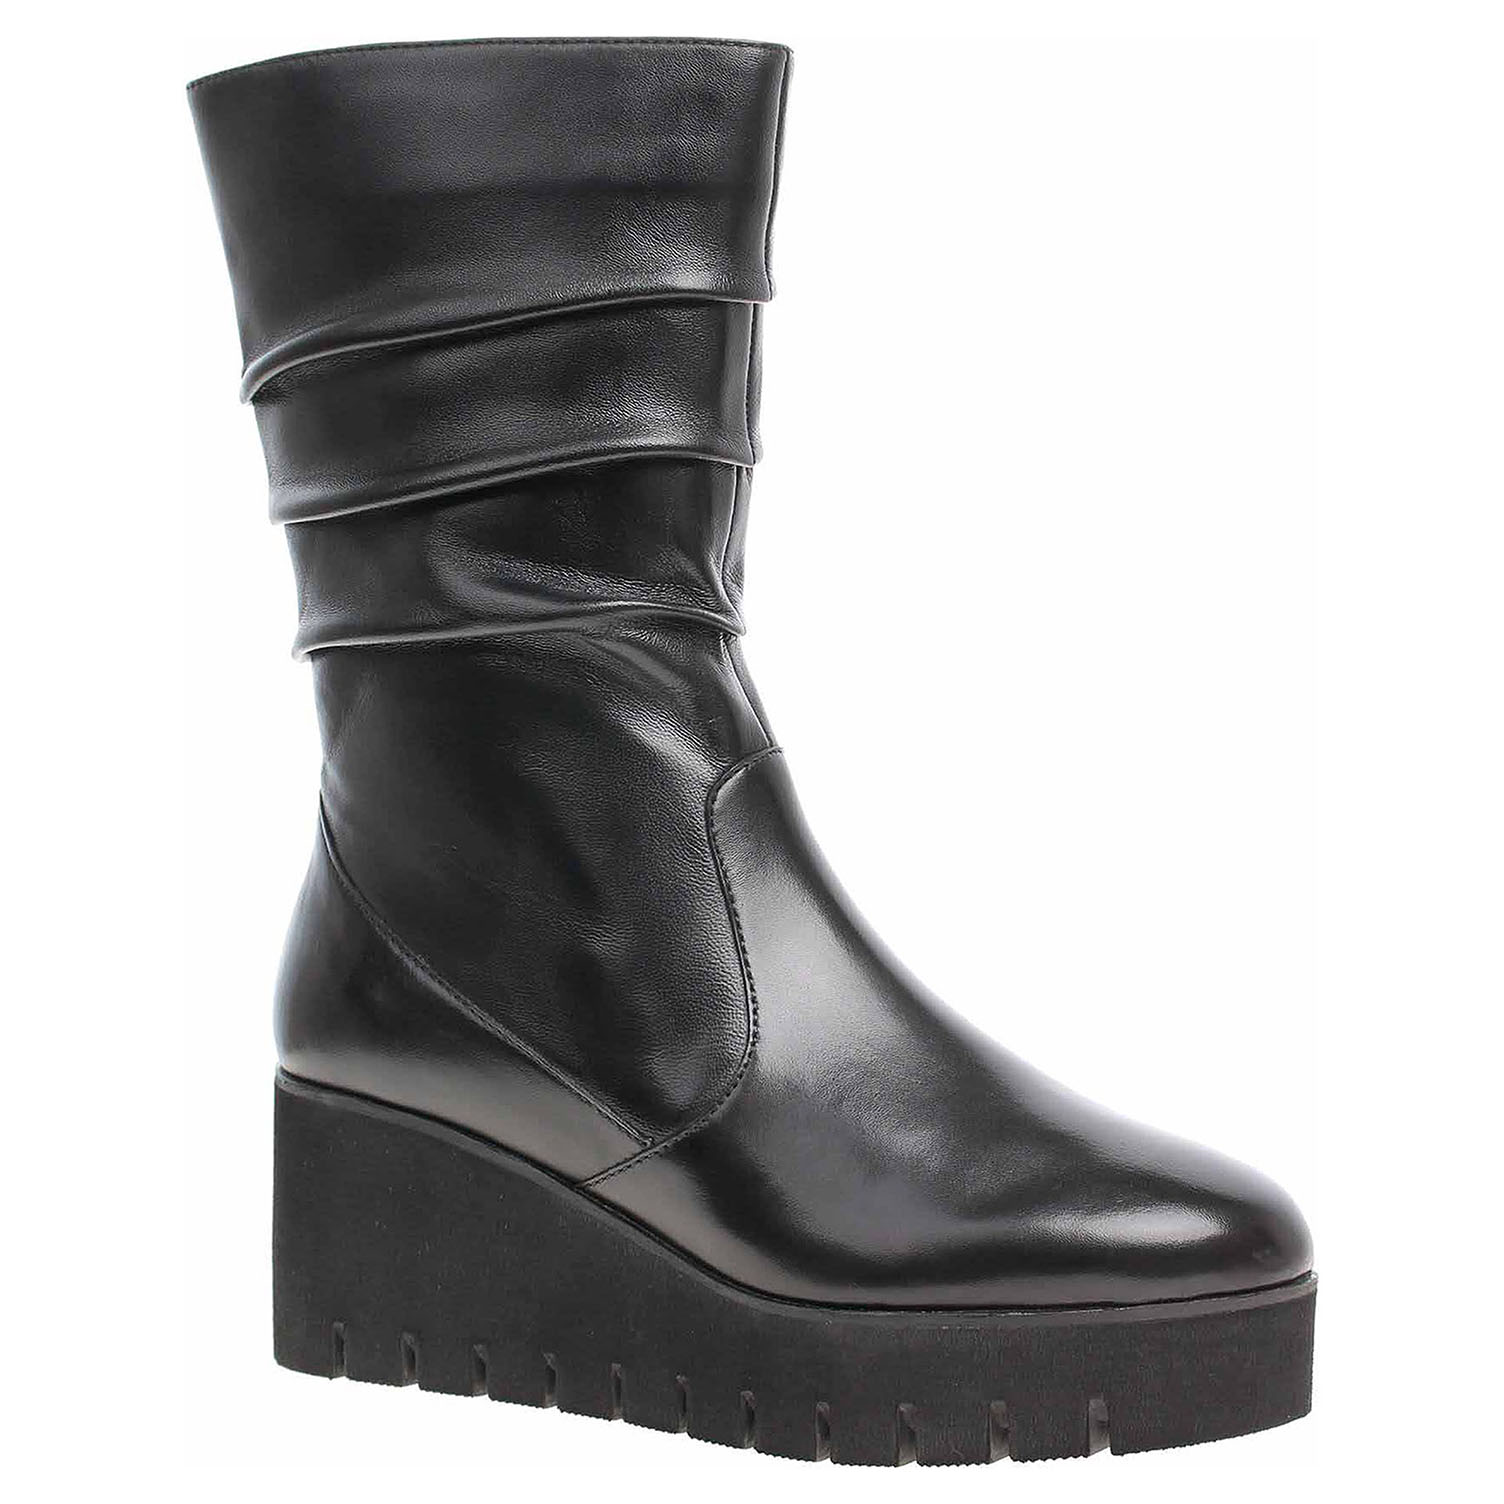 7297e9373 Deichmann obuv nadmerne damske velikosti levně | Mobilmania zboží